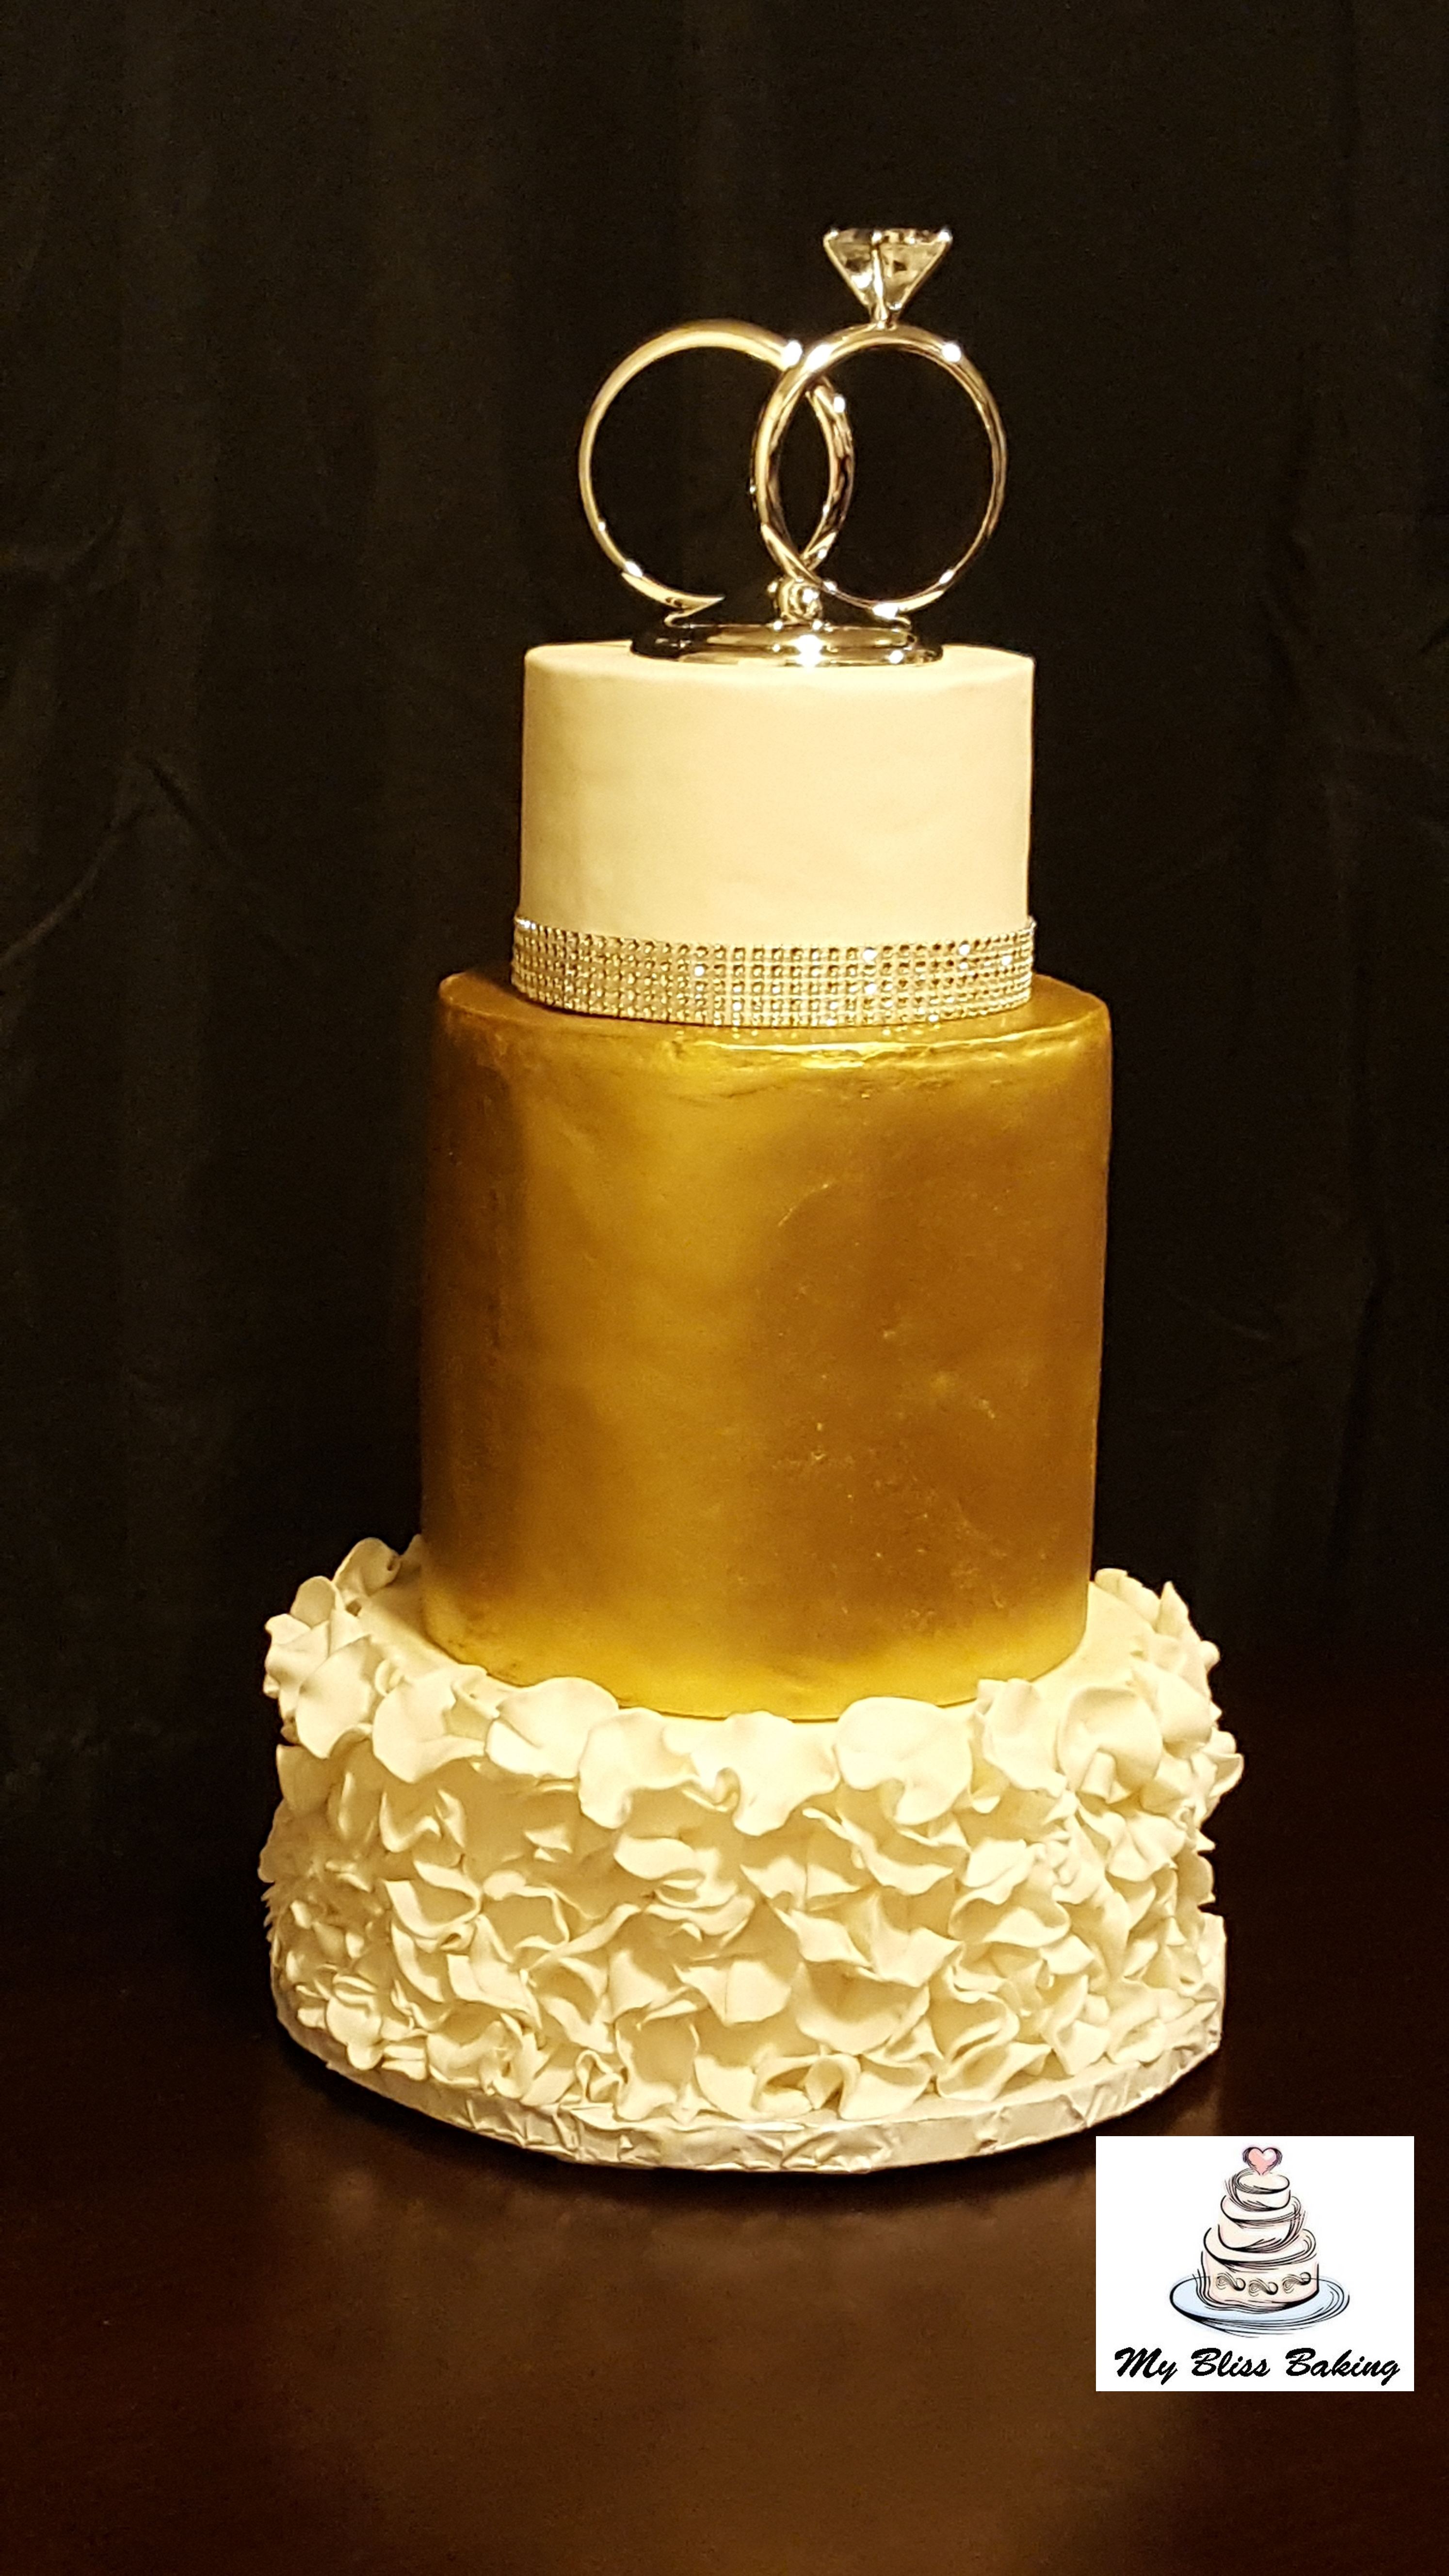 Custom Fondant Cakes | My Bliss Baking, LLC.